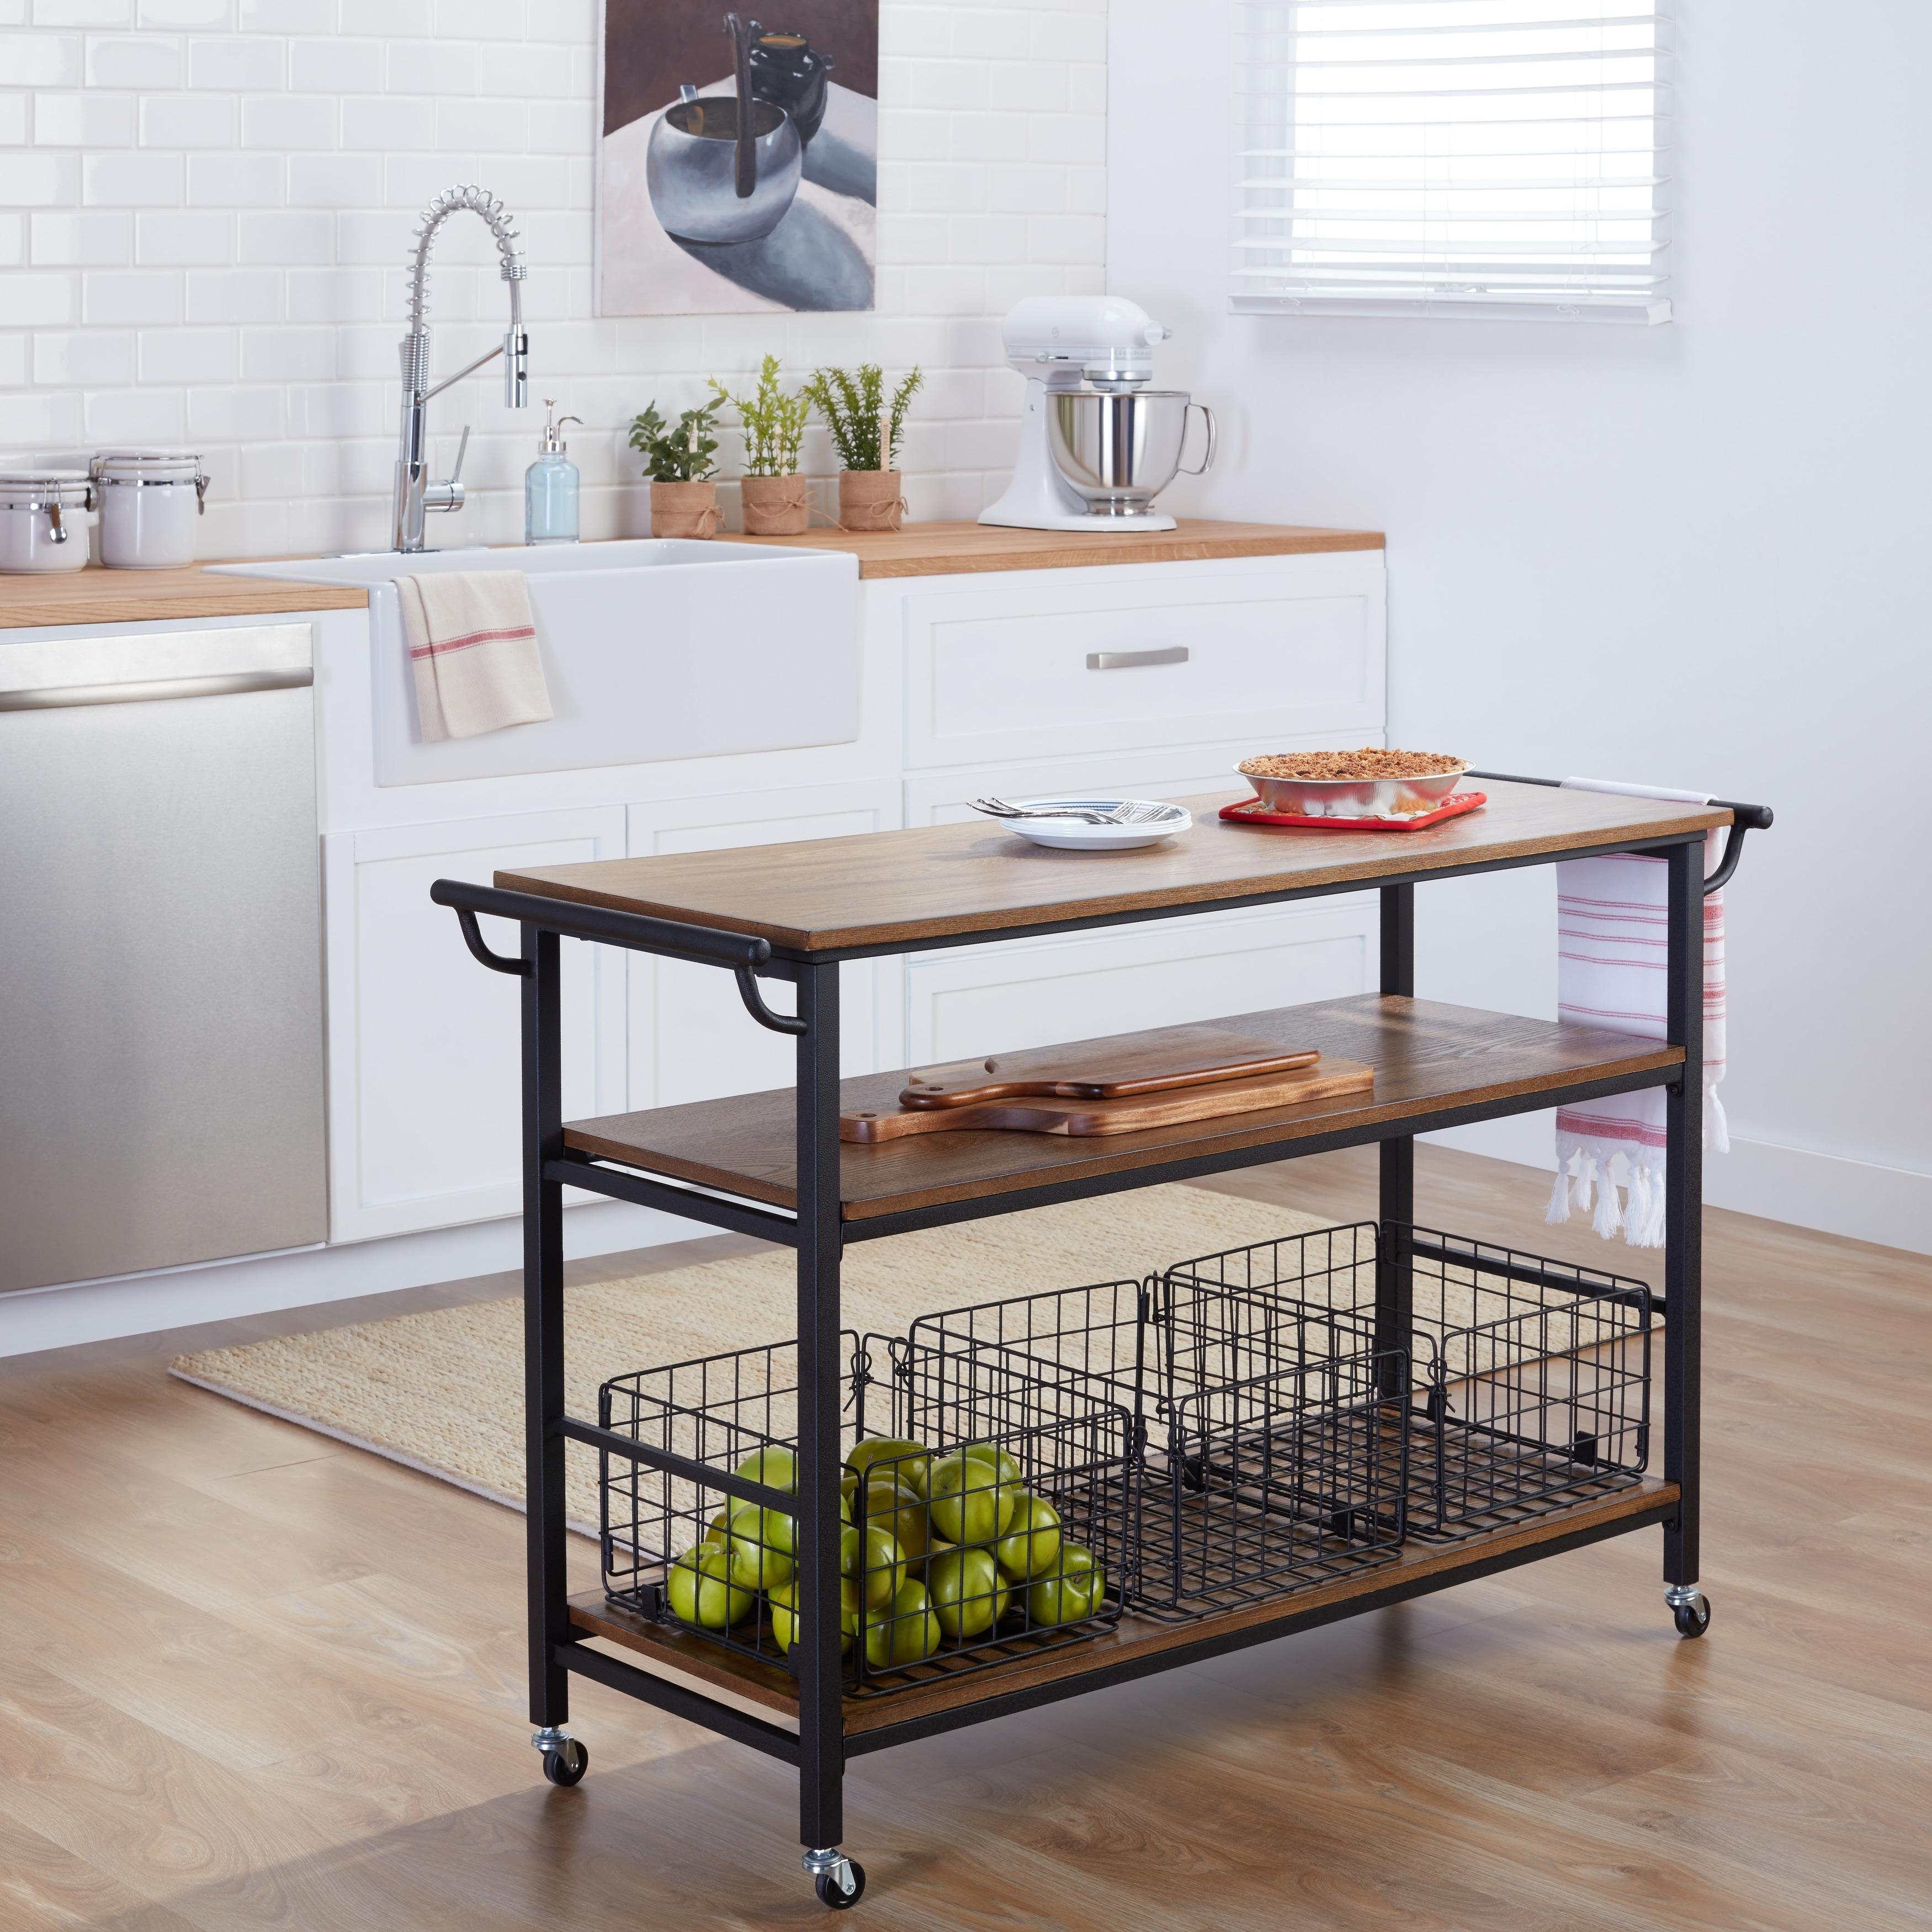 Details about Rolling Kitchen Island Cart Metal Frame Rustic Wood Tabletop  Shelves Baskets New